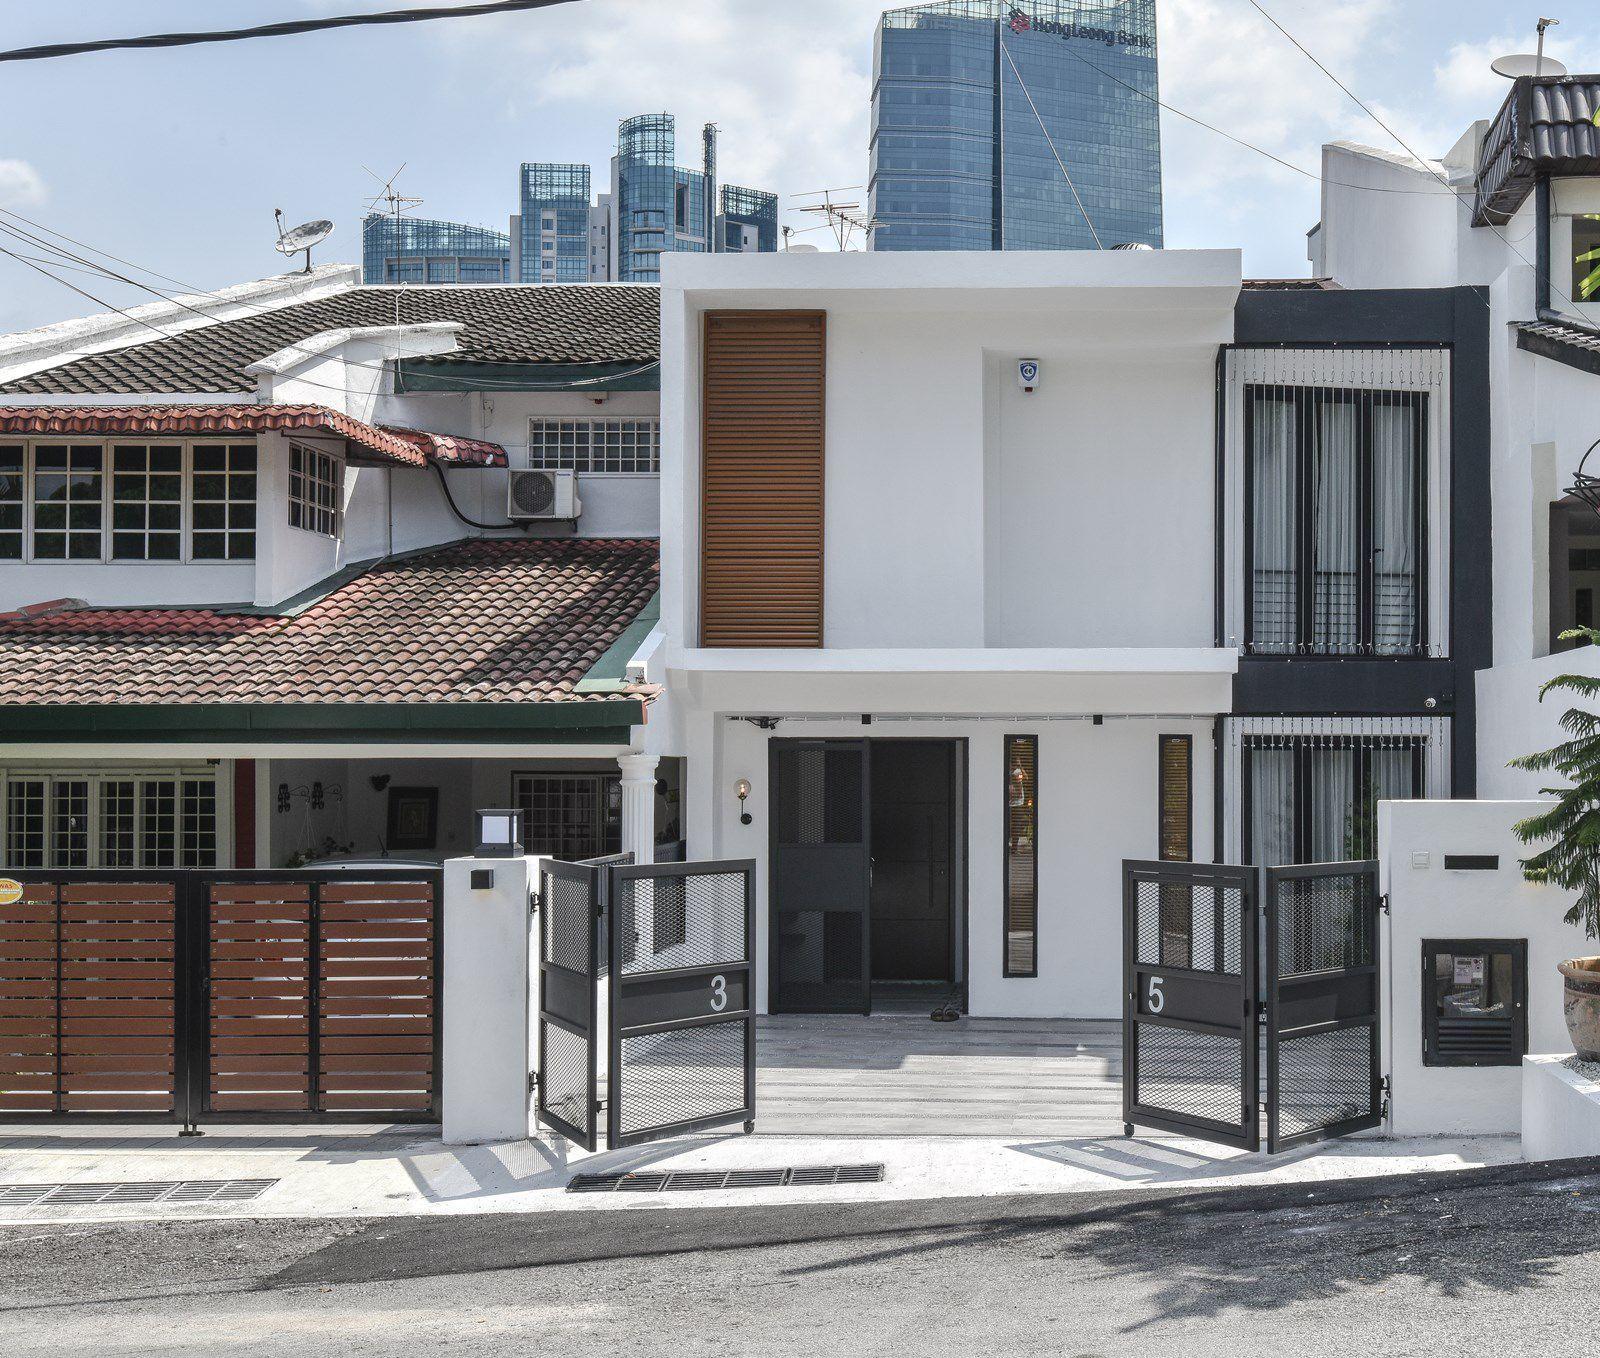 Modern Malaysian terrace house exterior design.   House ...